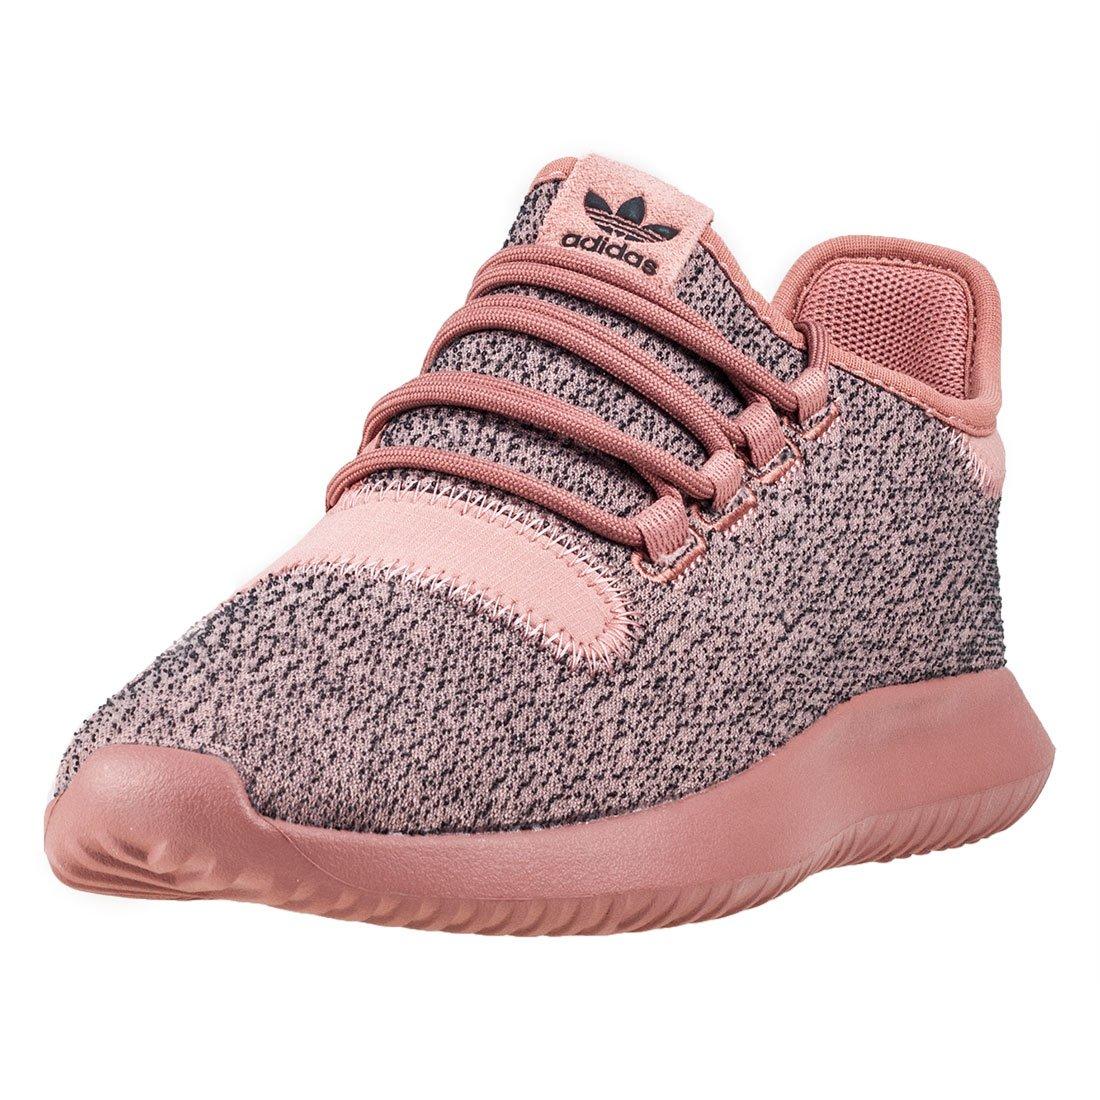 TALLA 38 2/3 EU. Adidas Tubular Shadow W, Zapatillas de Deporte para Mujer